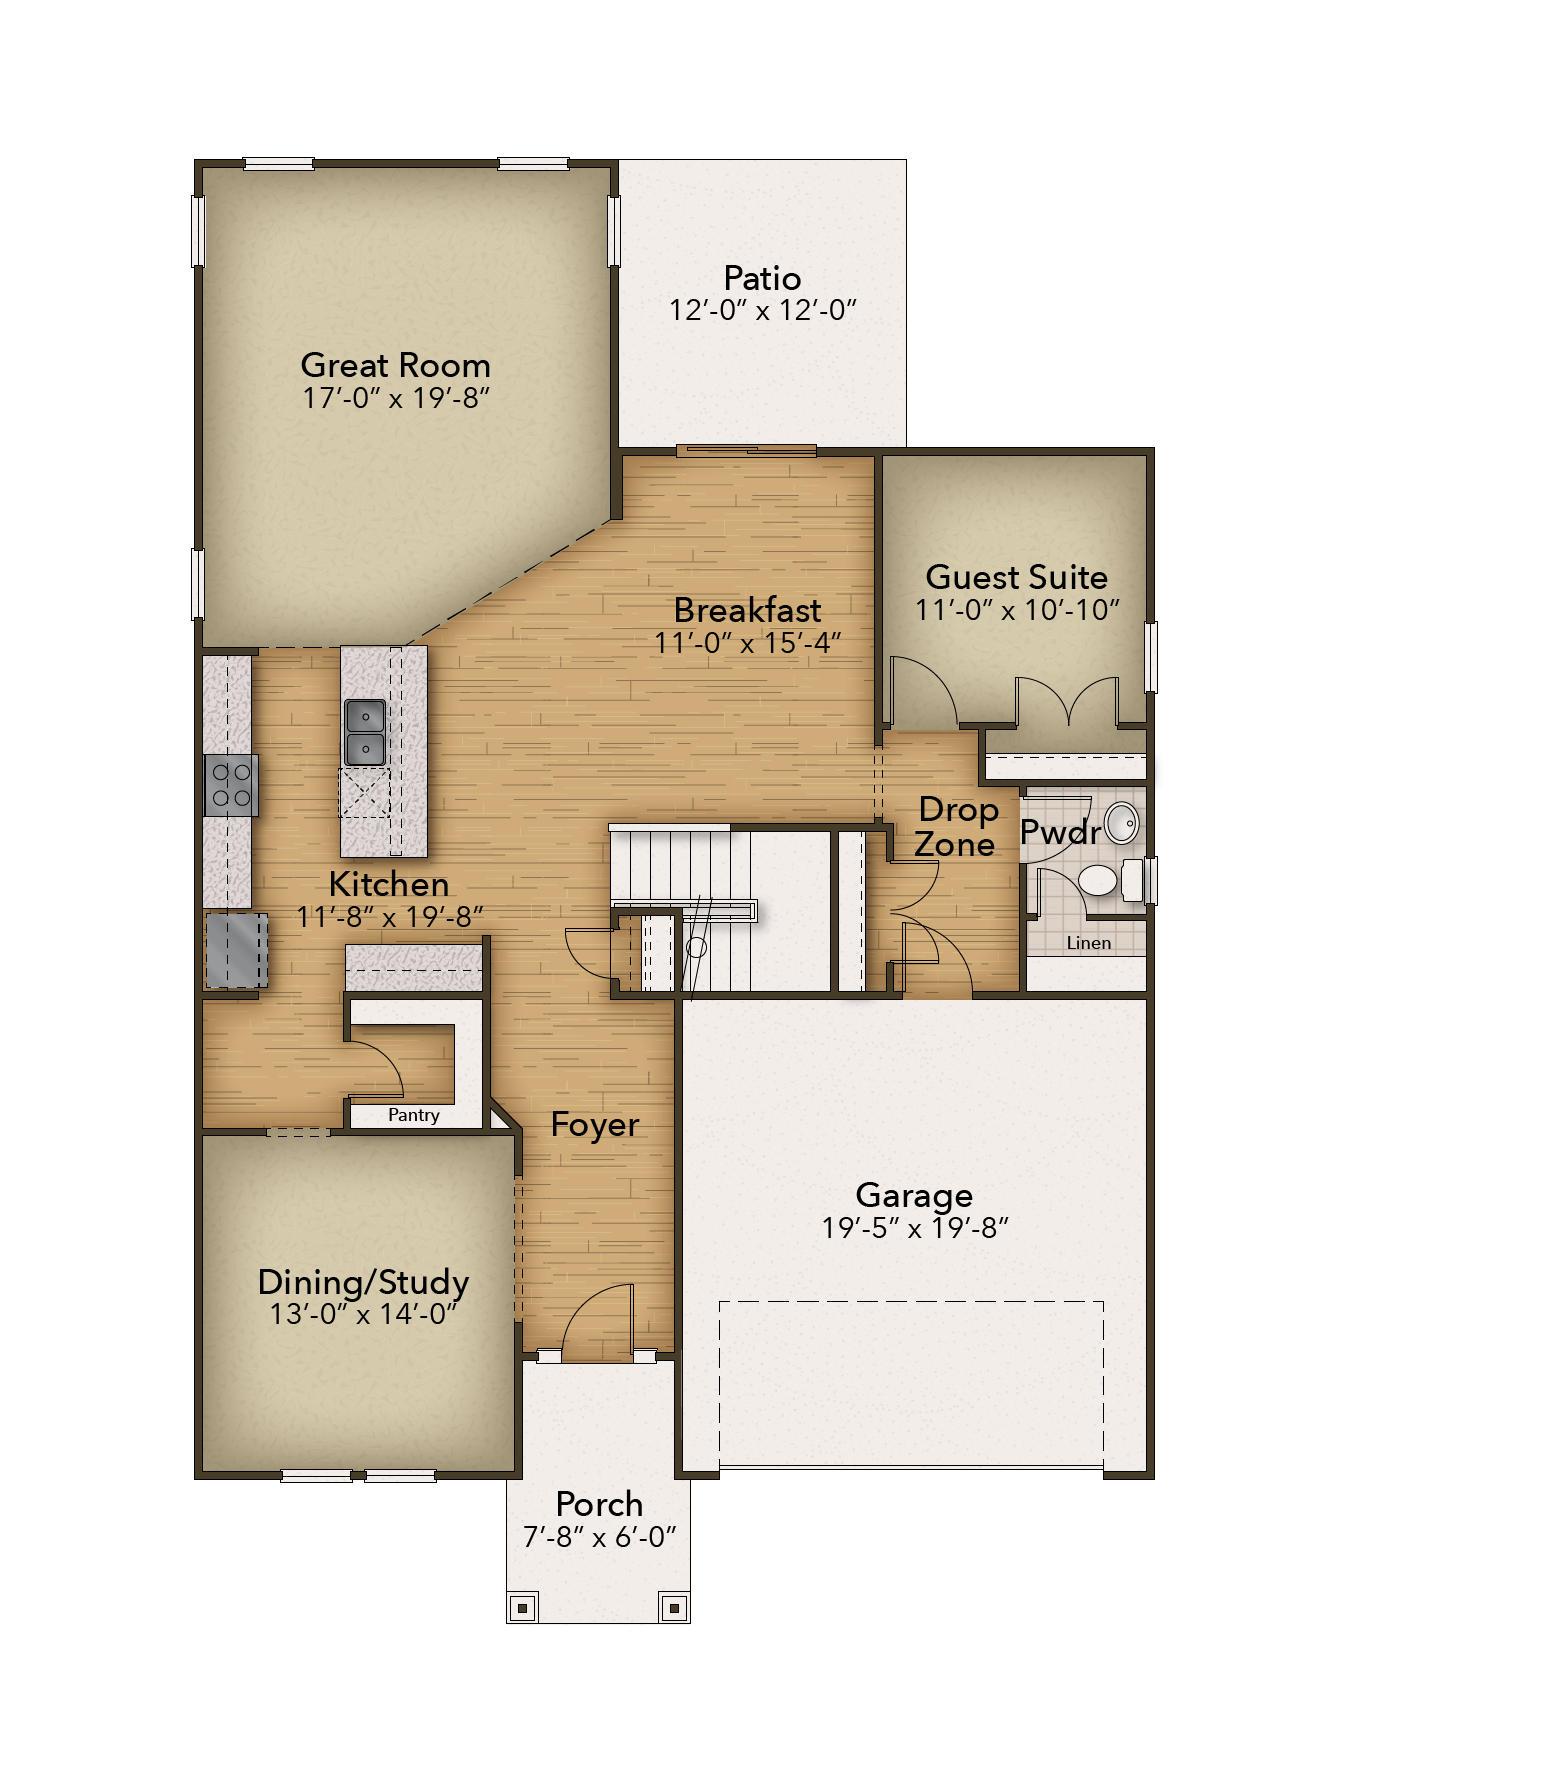 Chesapeake Homes -  The Mangrove First Floor